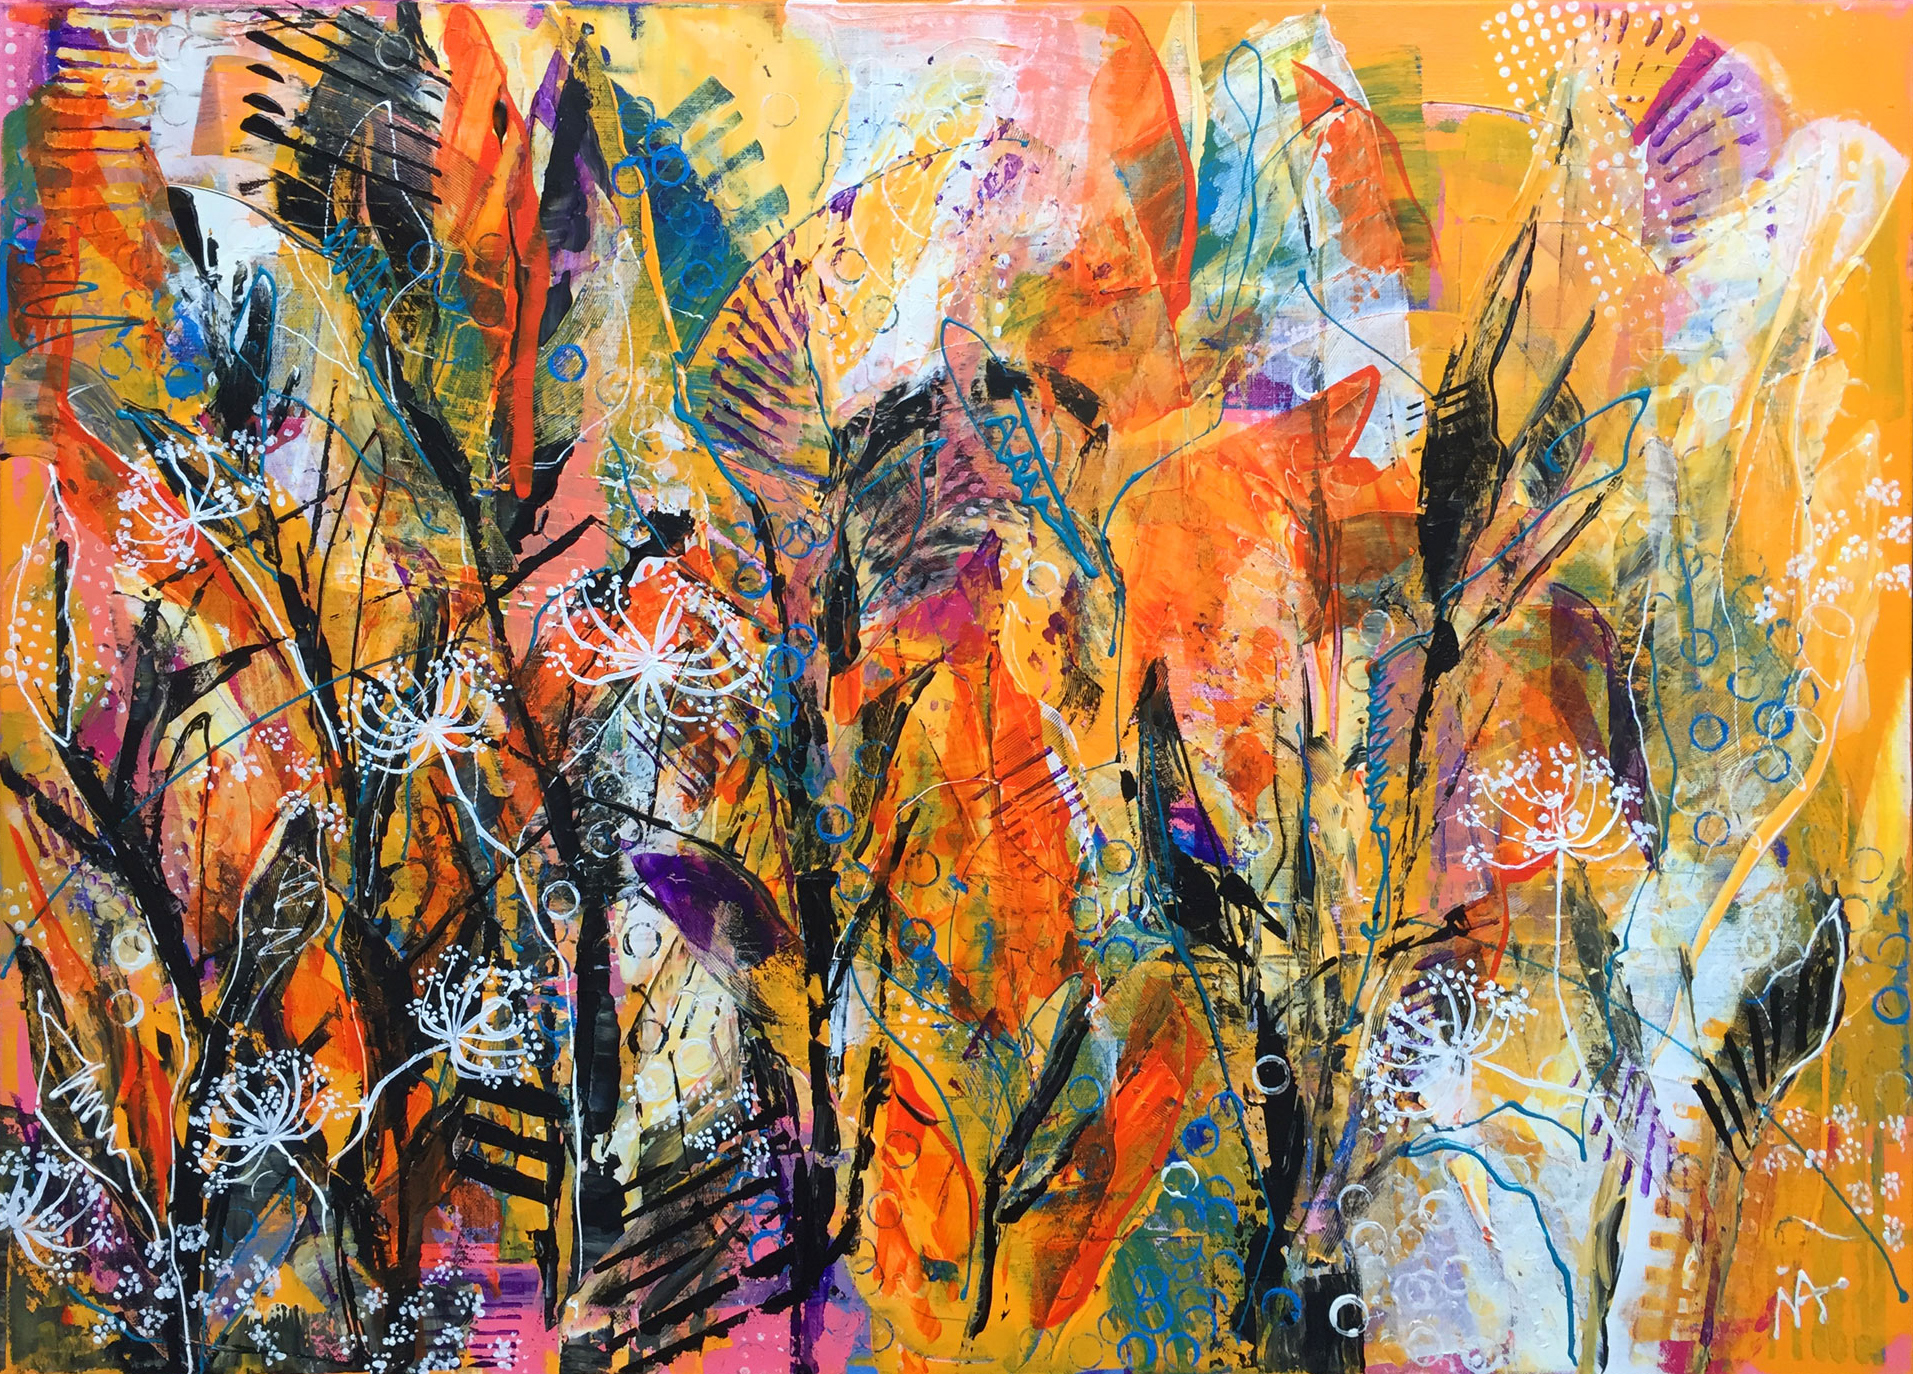 Ina Prodanova | In The Deepest |Acrylic | 95x69cm framed | £650